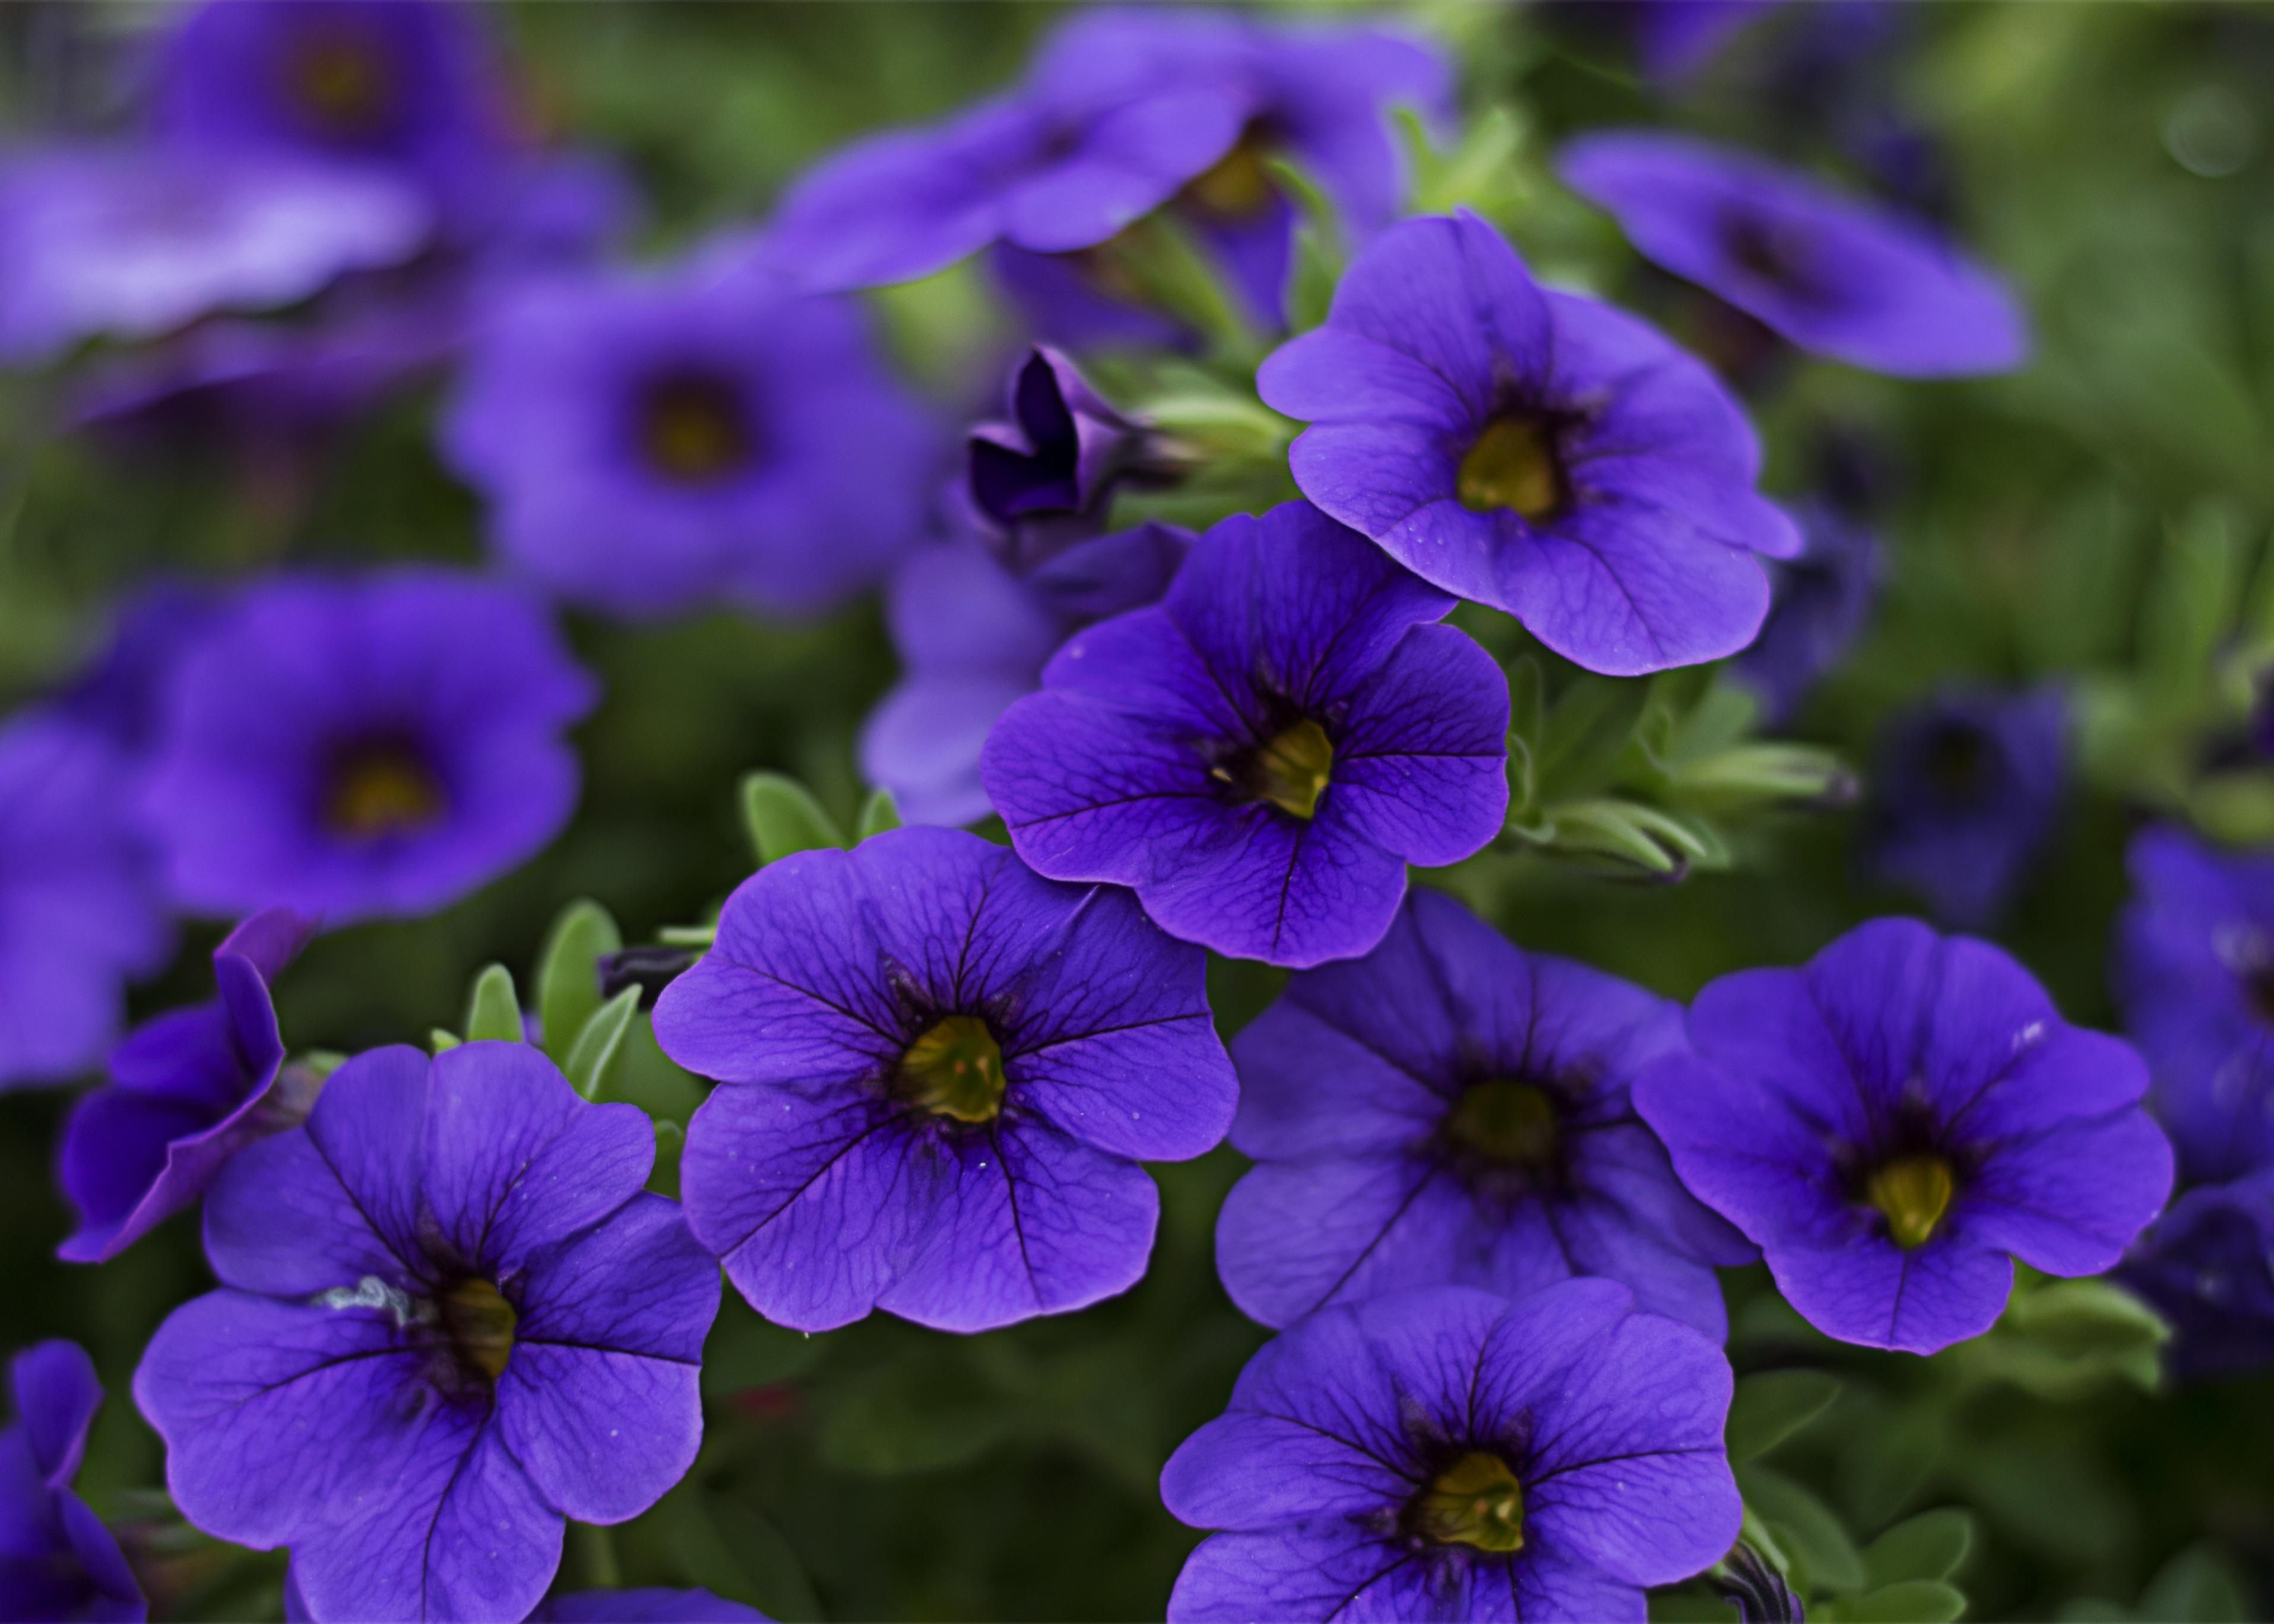 Lock Screen Wallpaper Iphone 7 Purple Flowers 183 Pexels 183 Free Stock Photos